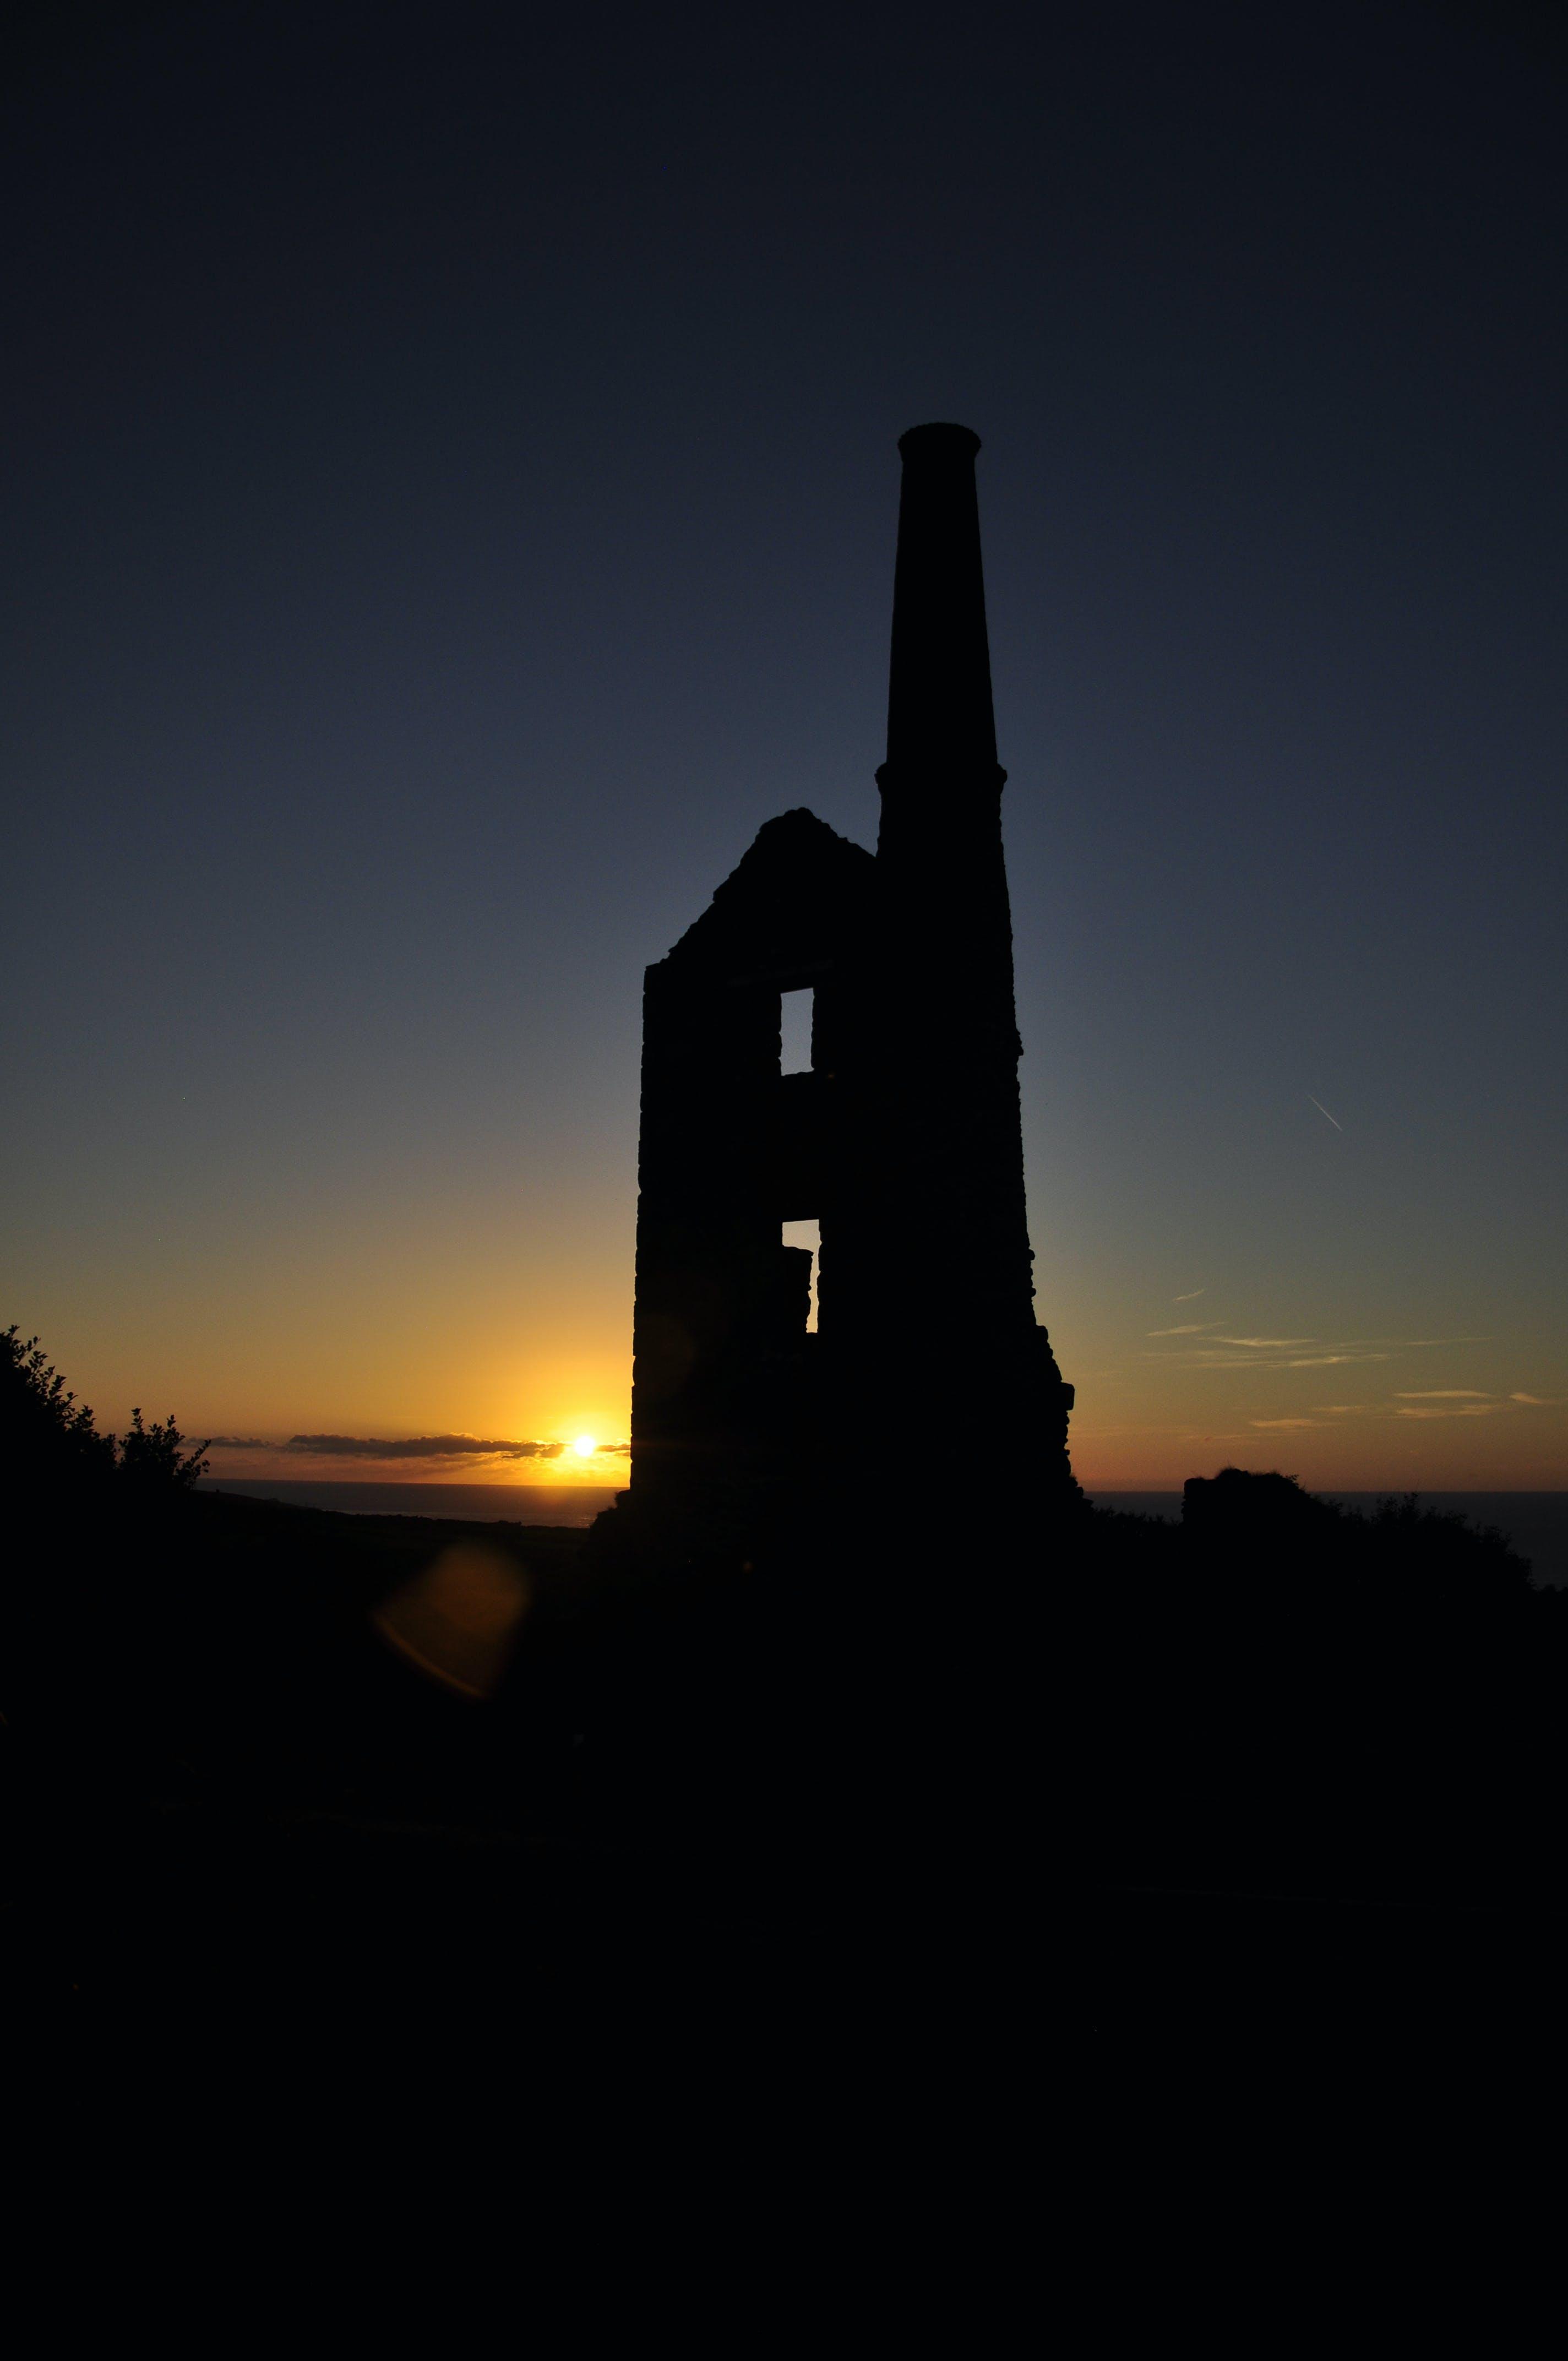 Free stock photo of engine house. mining, silhouette, sunset